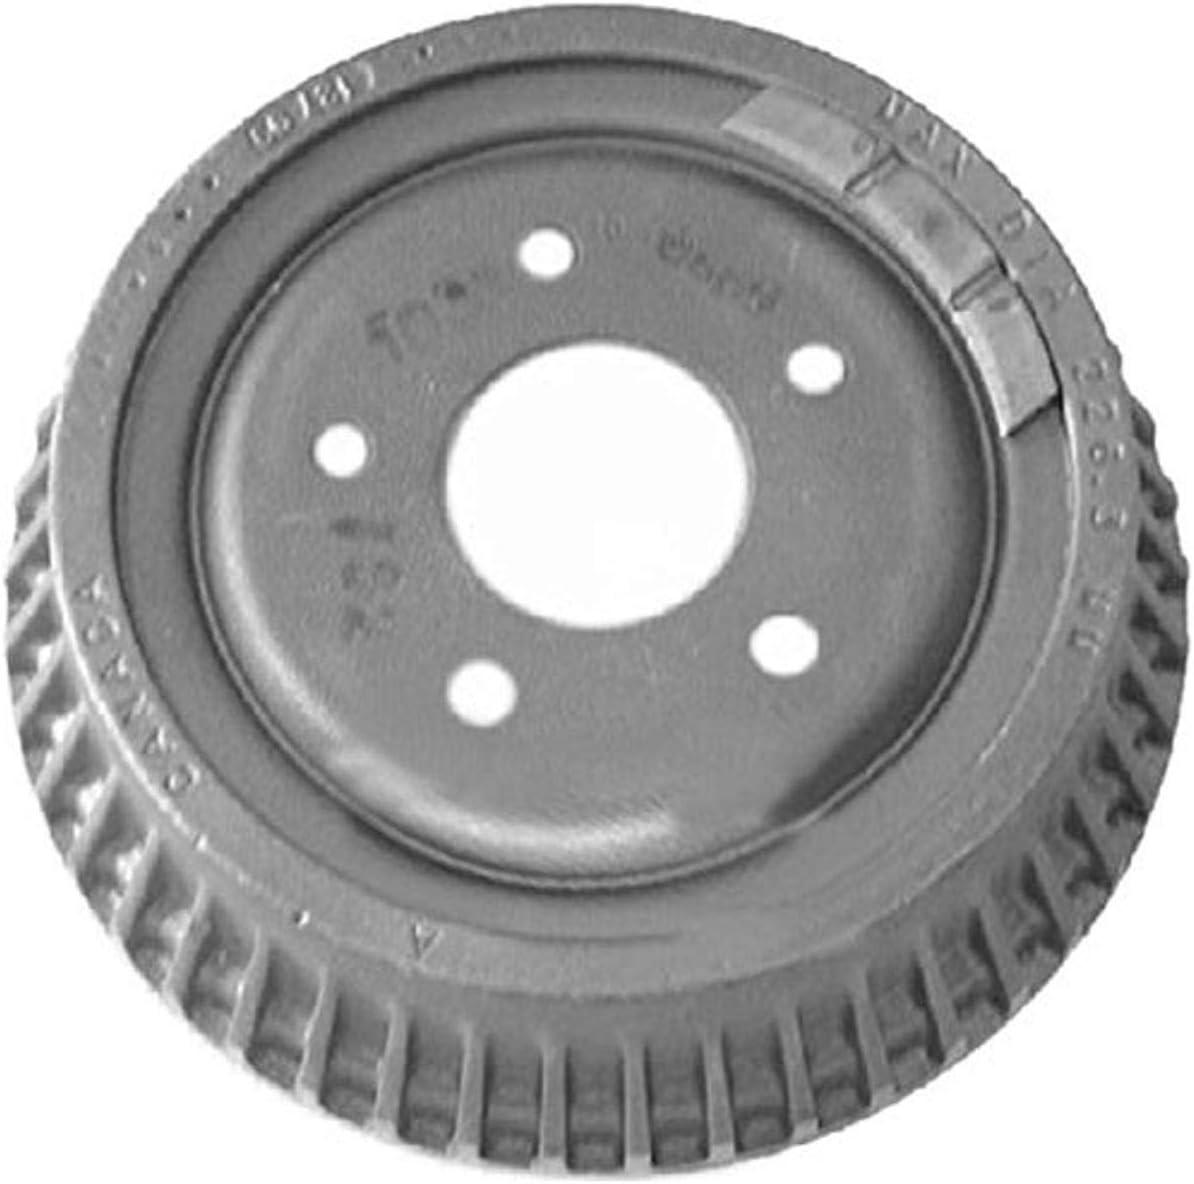 Cheap bargain Dallas Mall Bendix Premium Drum and PDR0451 Rotor Rear Brake